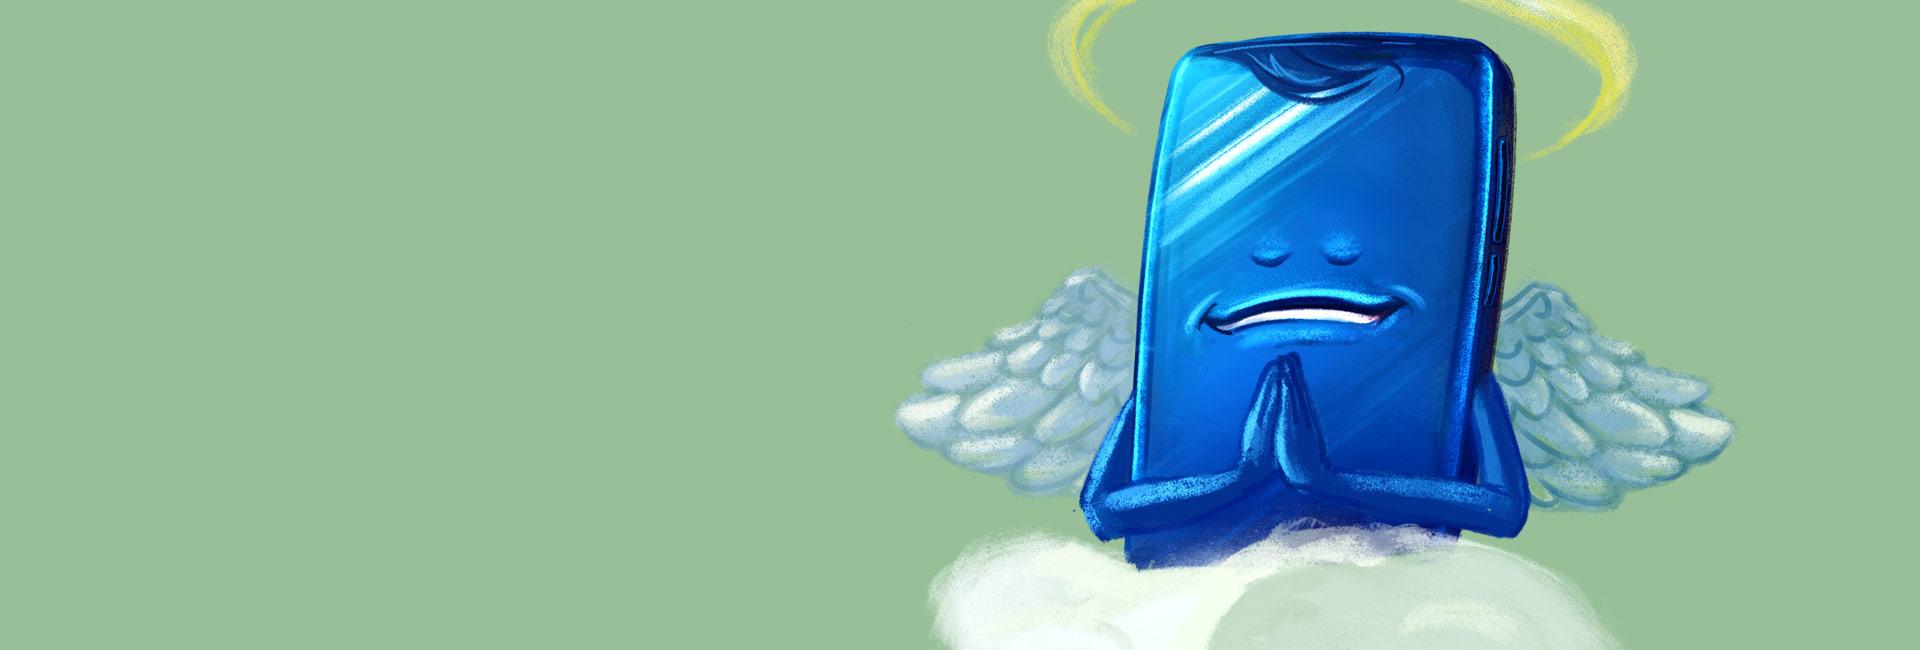 mobil ilustracie superintro